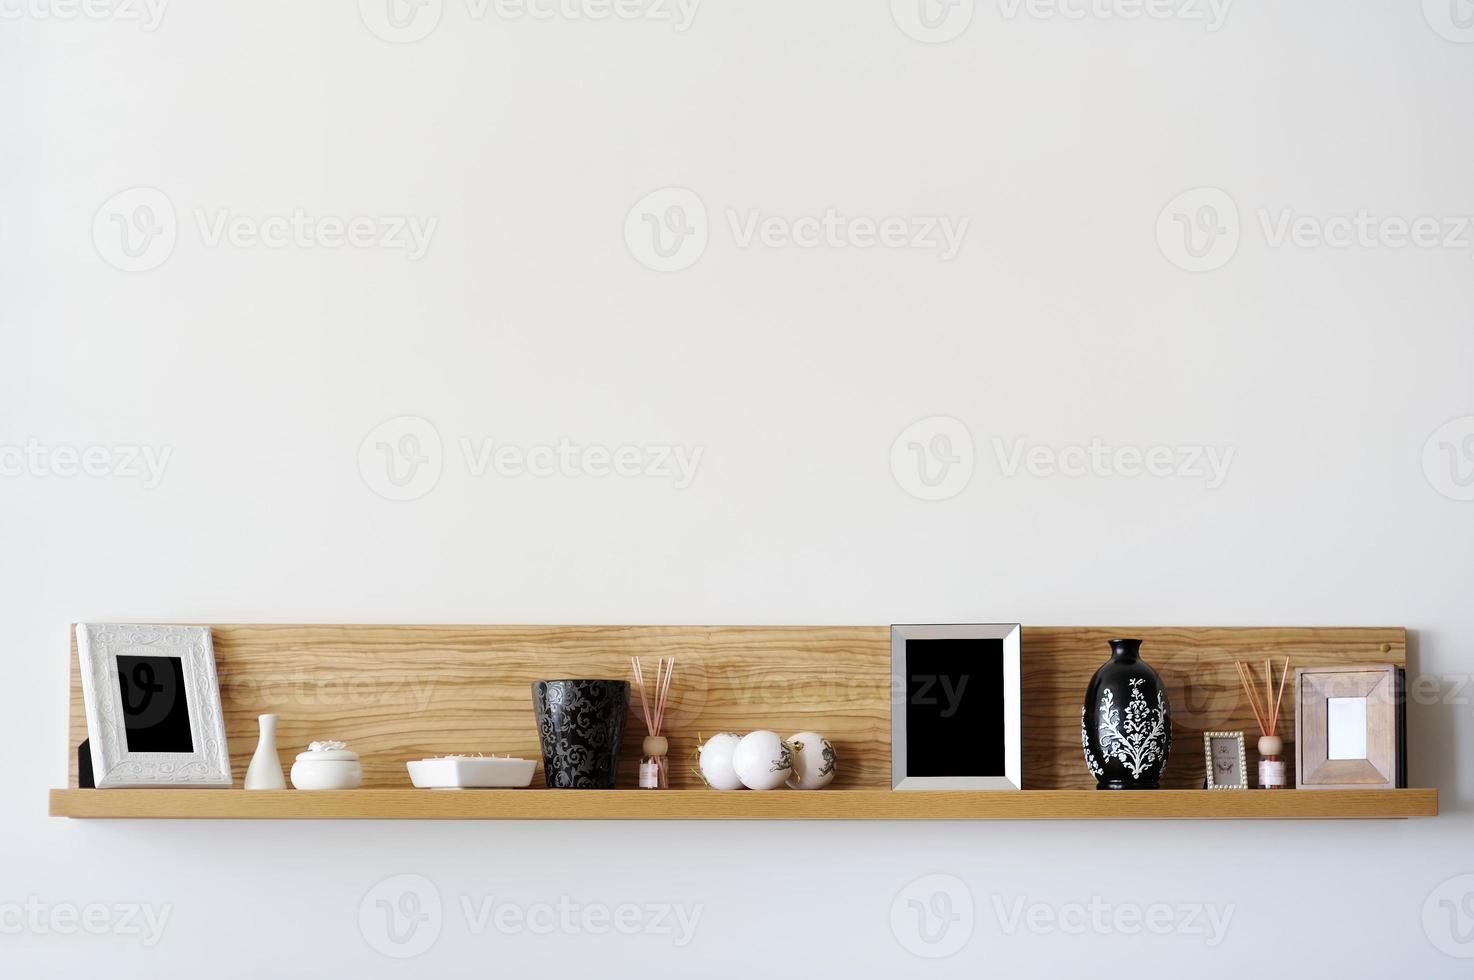 stijlvolle boekenplank foto